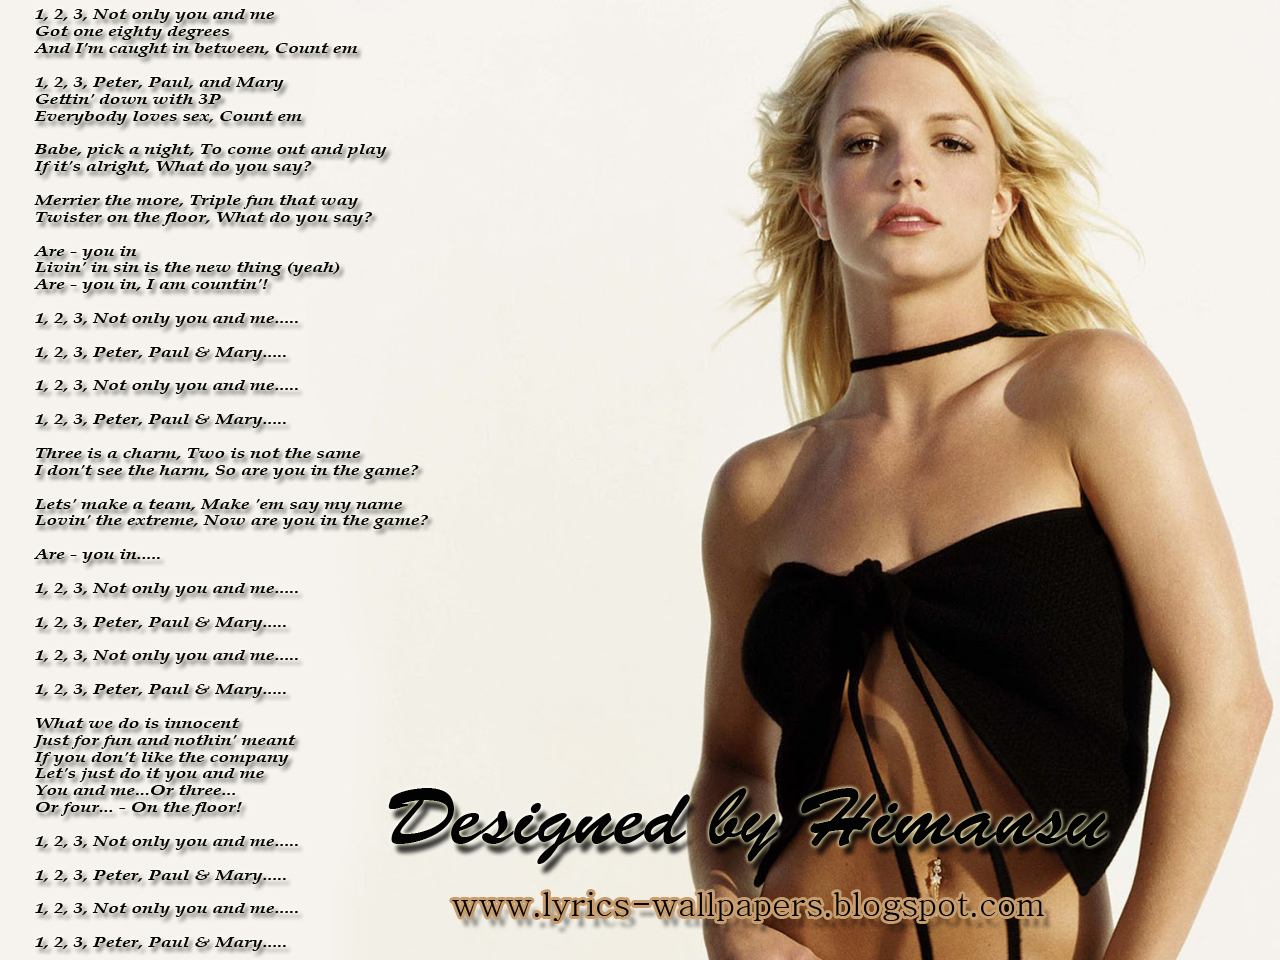 http://3.bp.blogspot.com/-TAzeTg4SjyA/URXwyXZUR8I/AAAAAAAAA5A/kQzl0dgwZ0M/s1600/Lyrics+Wallpapers+-+Britney+Spears+-+3.jpg